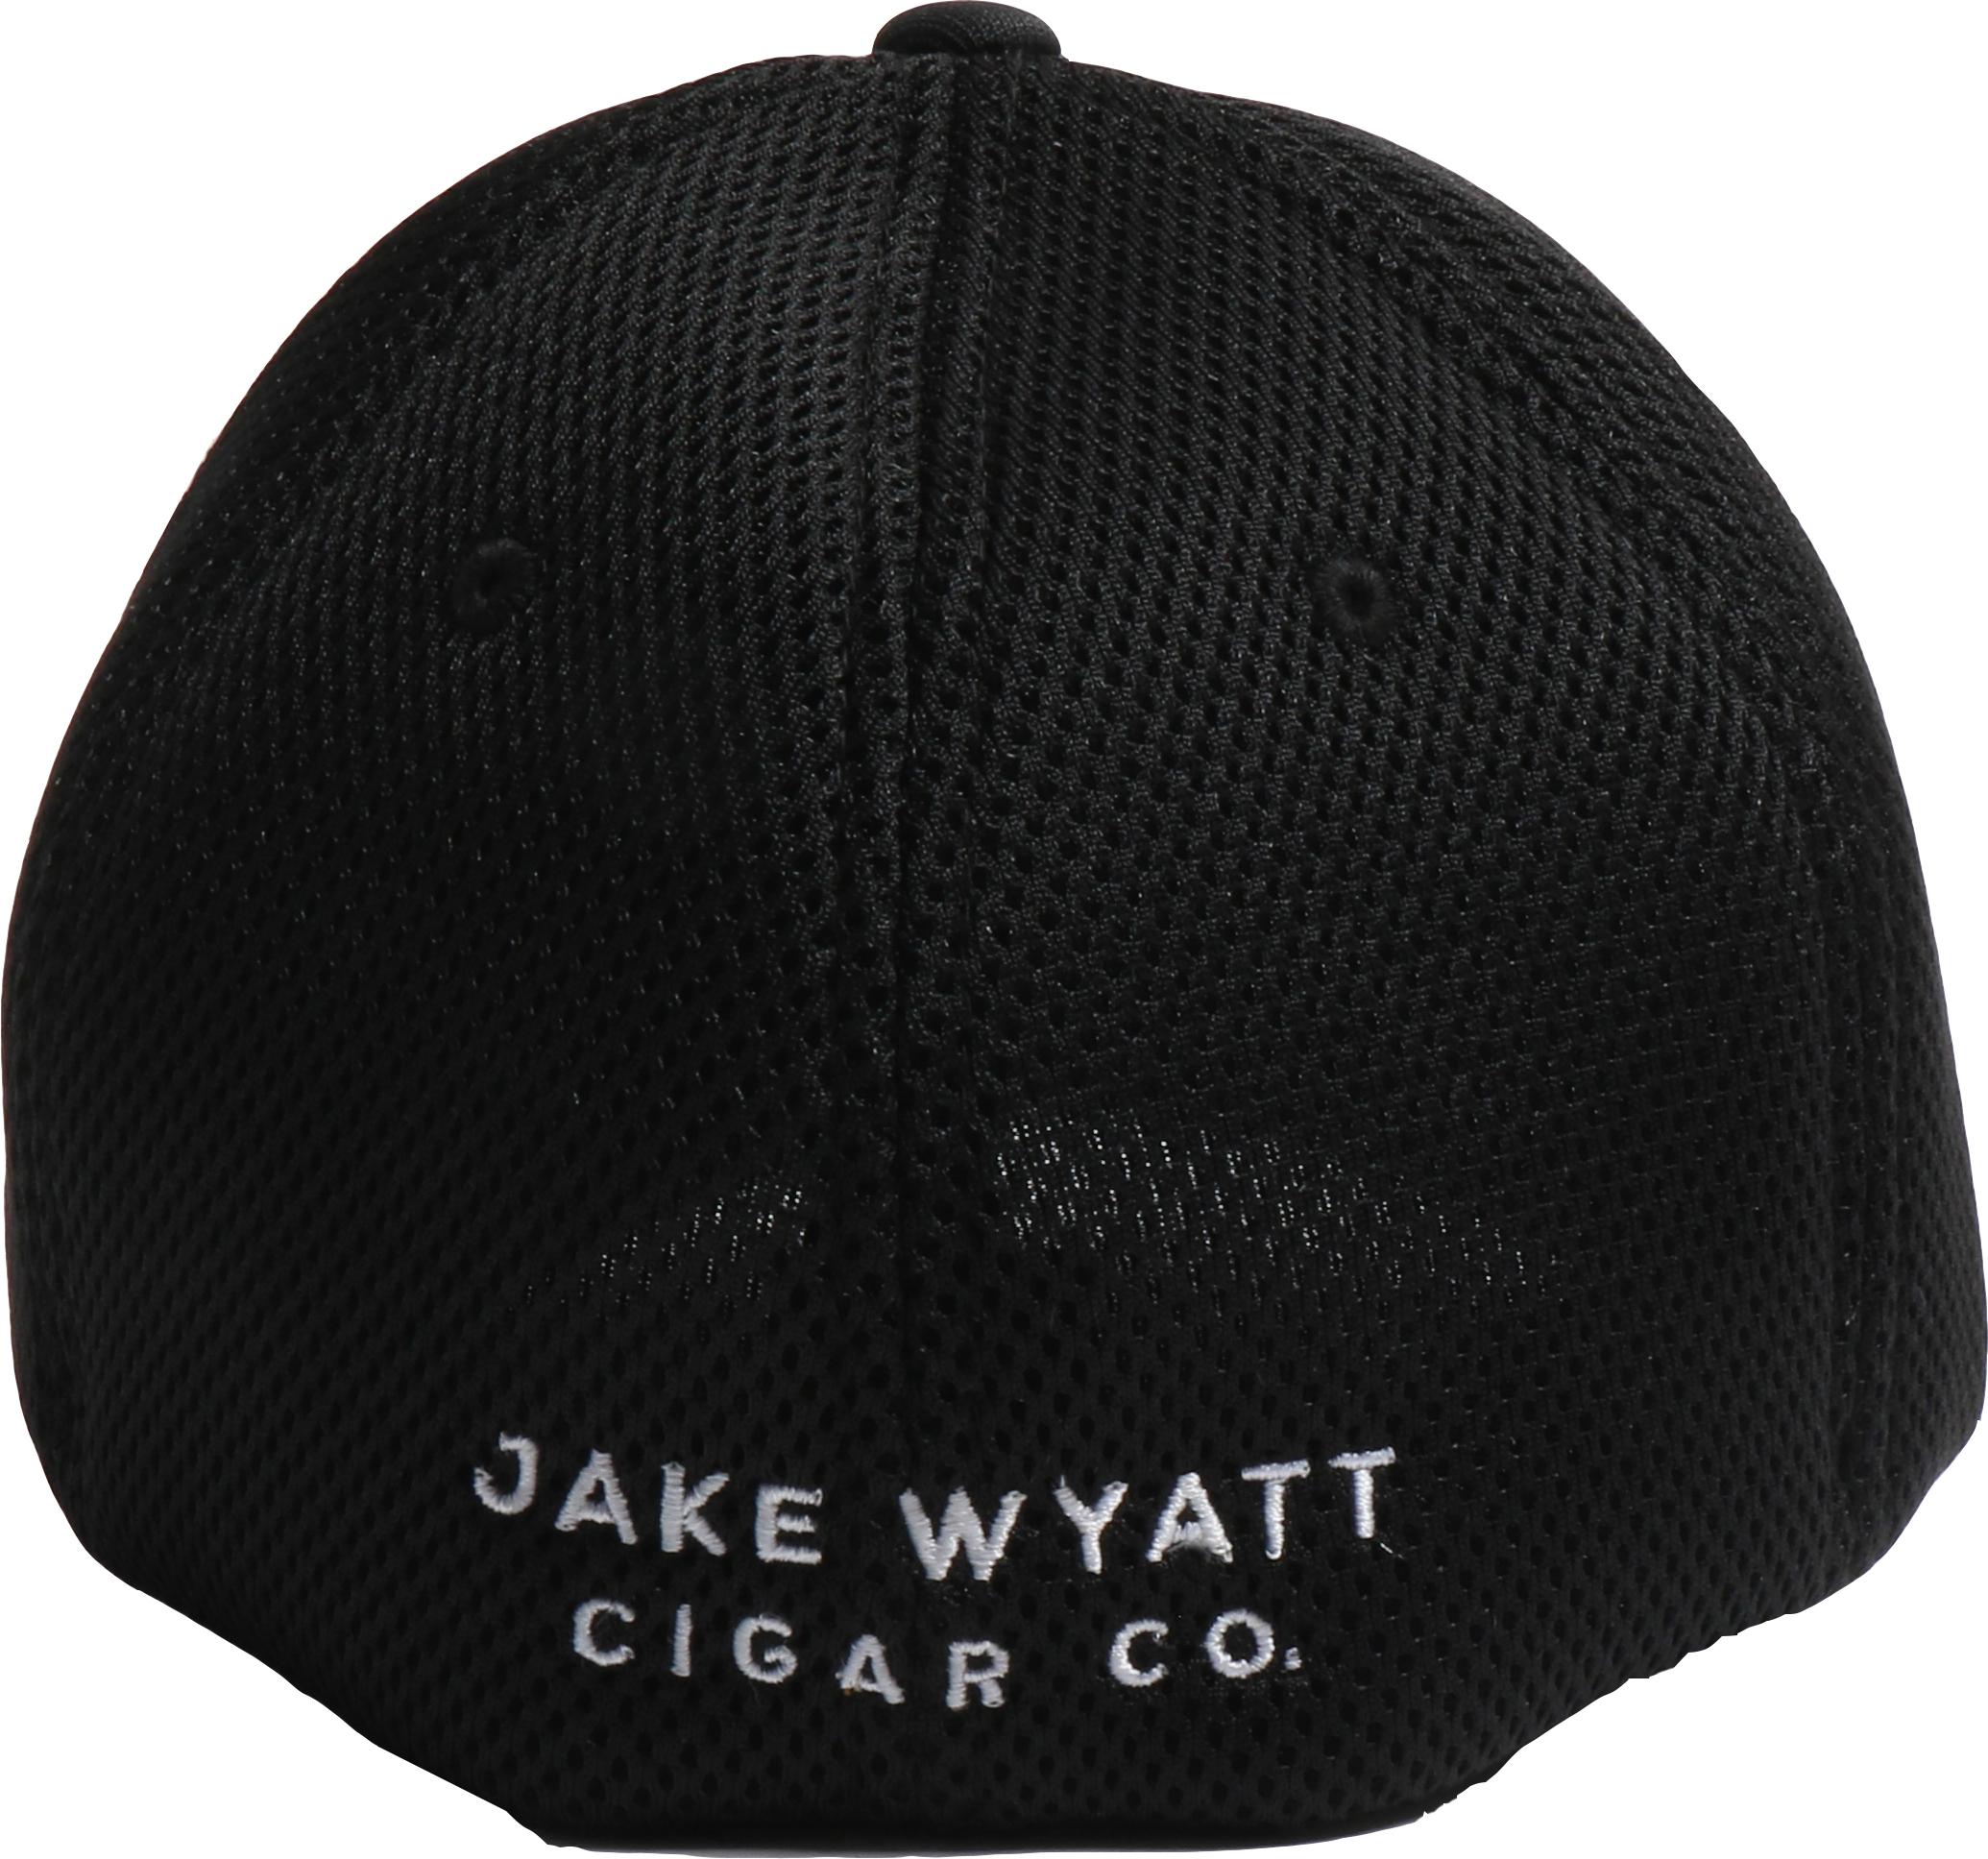 Jake Wyatt Cigar Co. - Hat